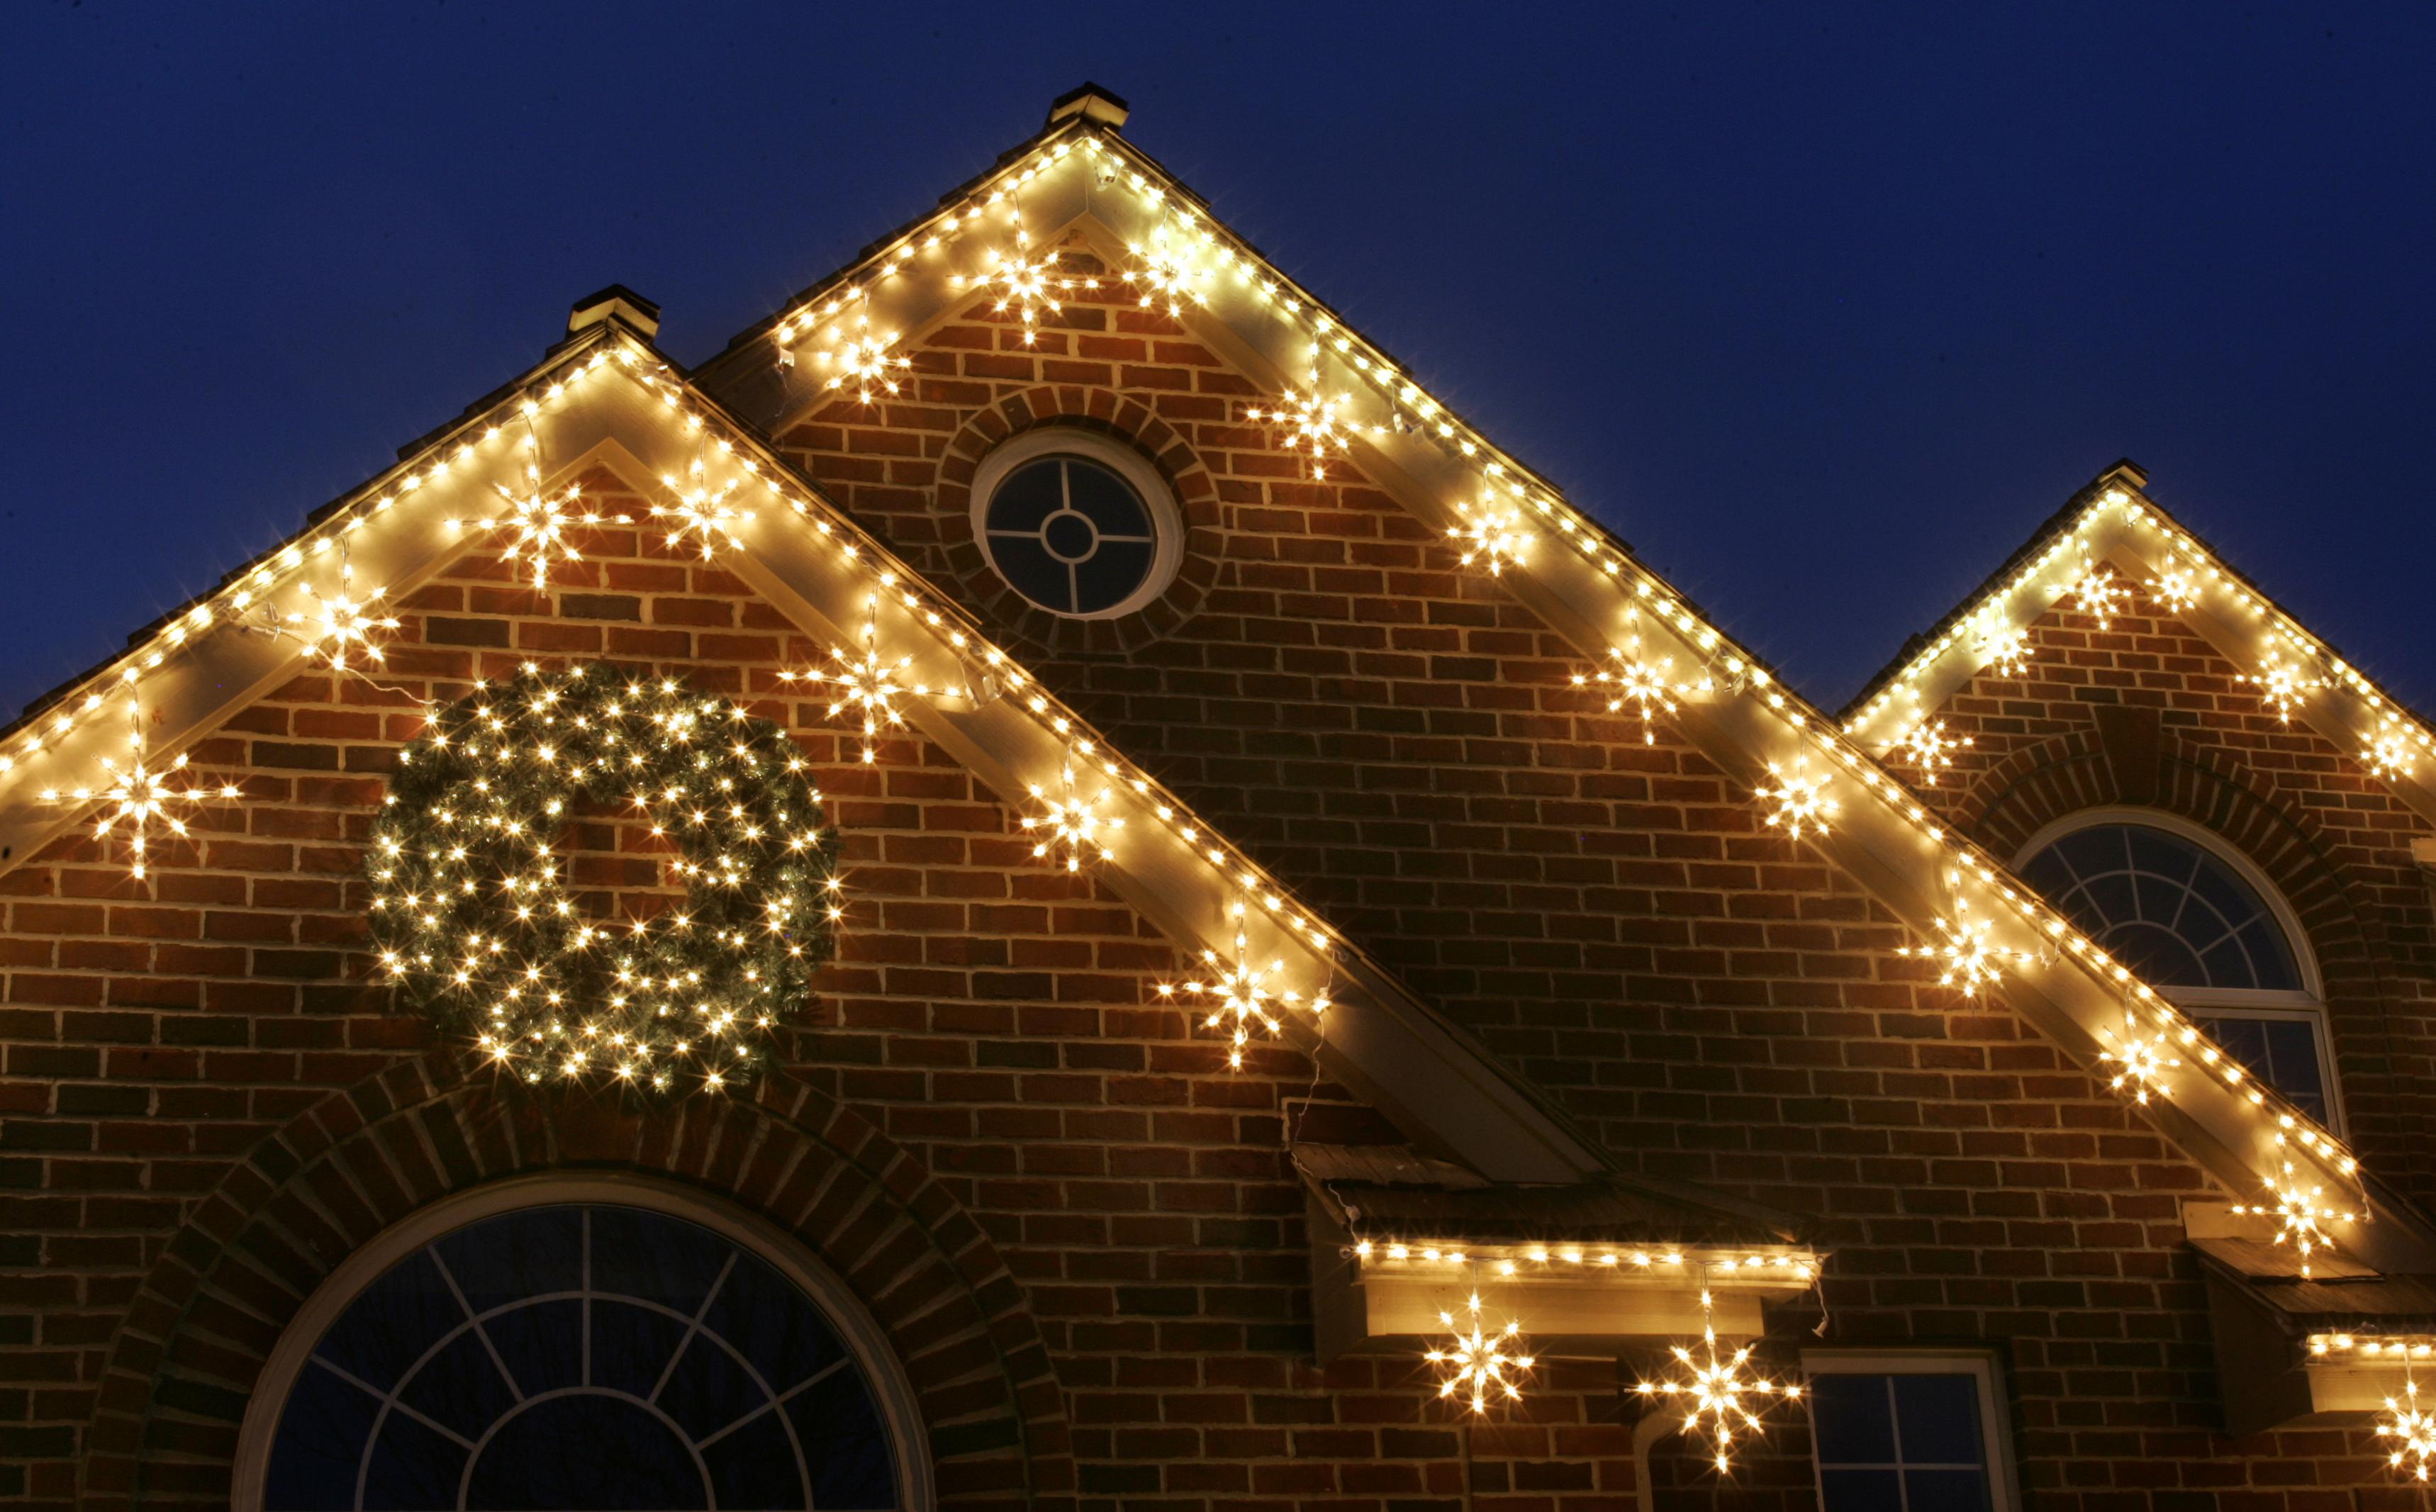 Long island 39 s 1 outdoor holiday lighting company for Lights company